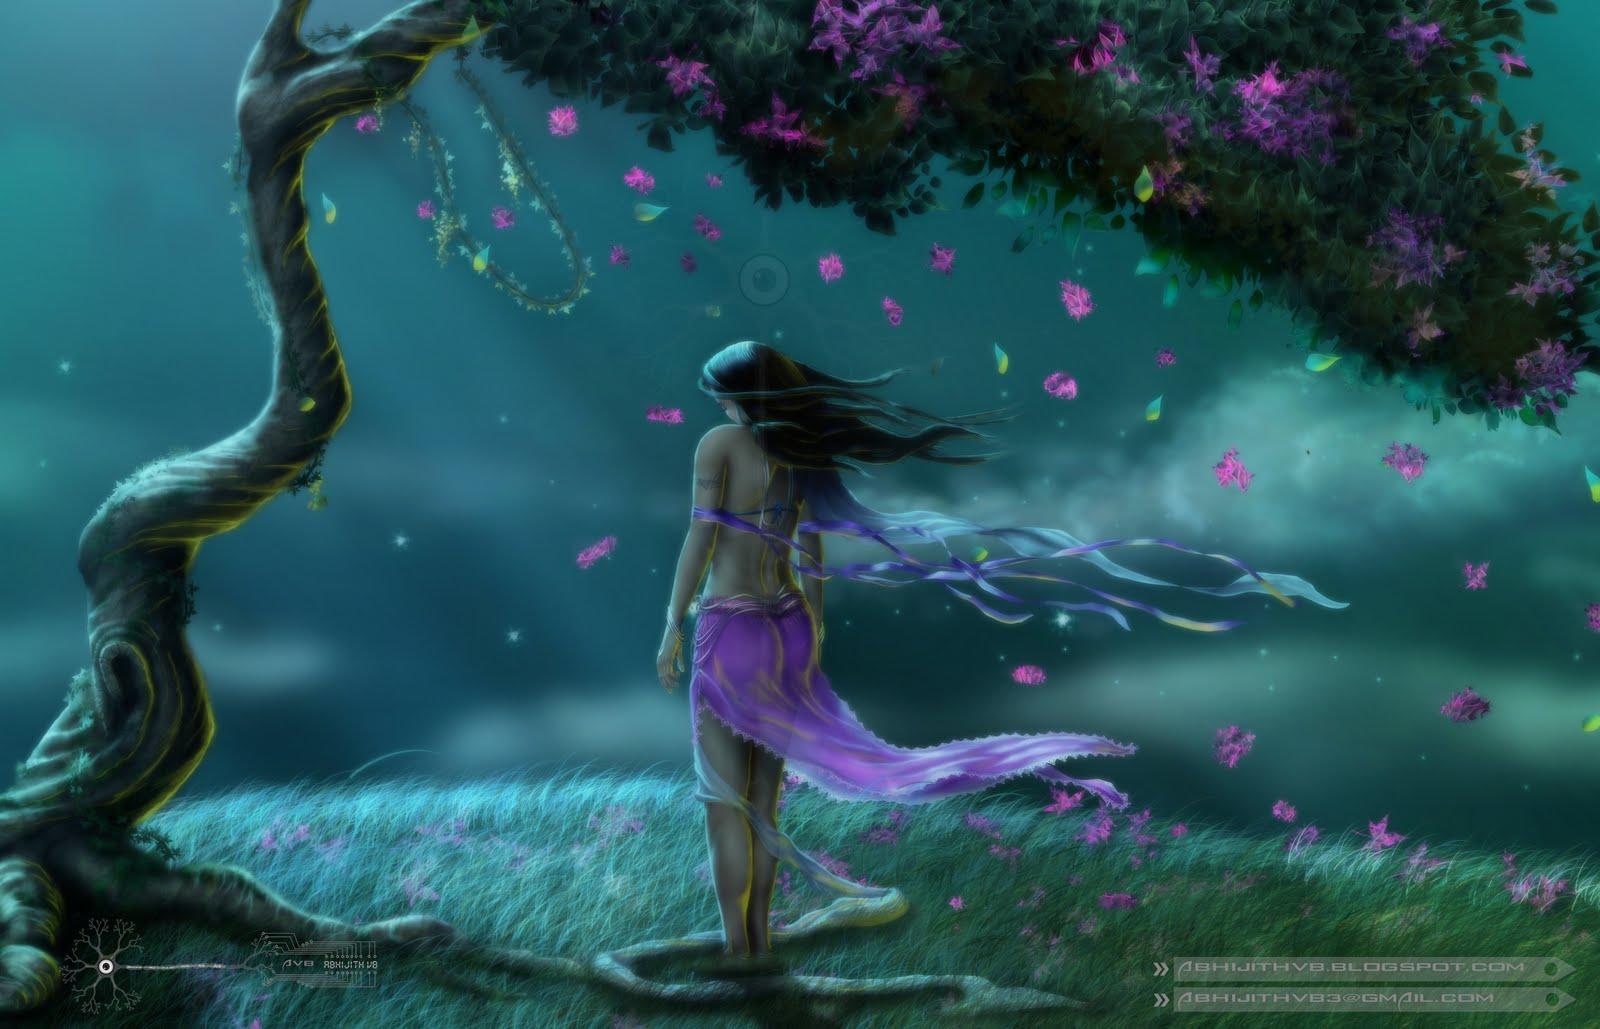 Beautiful Sad Paintings My Photoshop Paintings - Beautiful Sad Woman Painting - HD Wallpaper